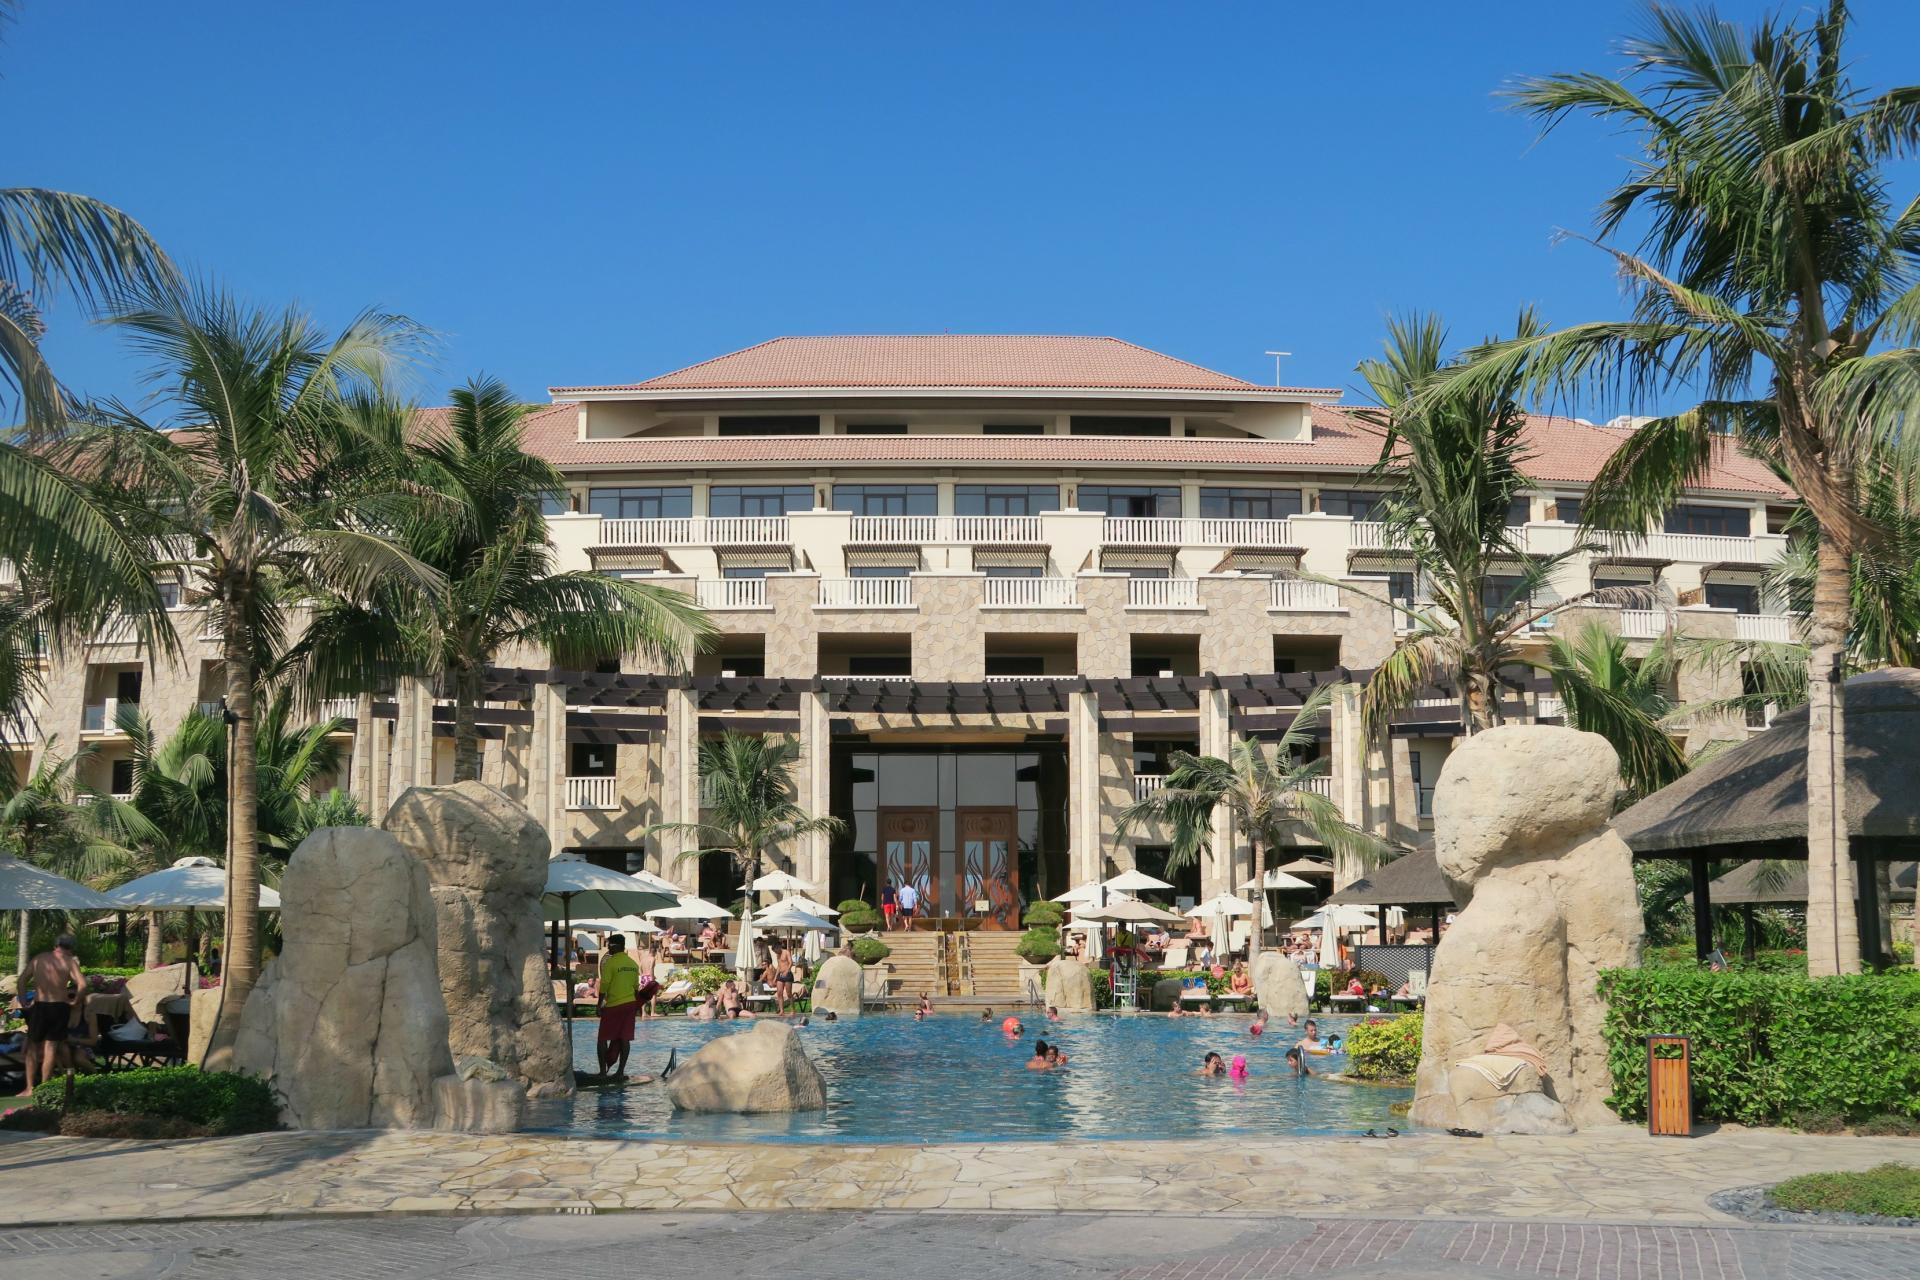 Sofitel Dubai The Palm pool